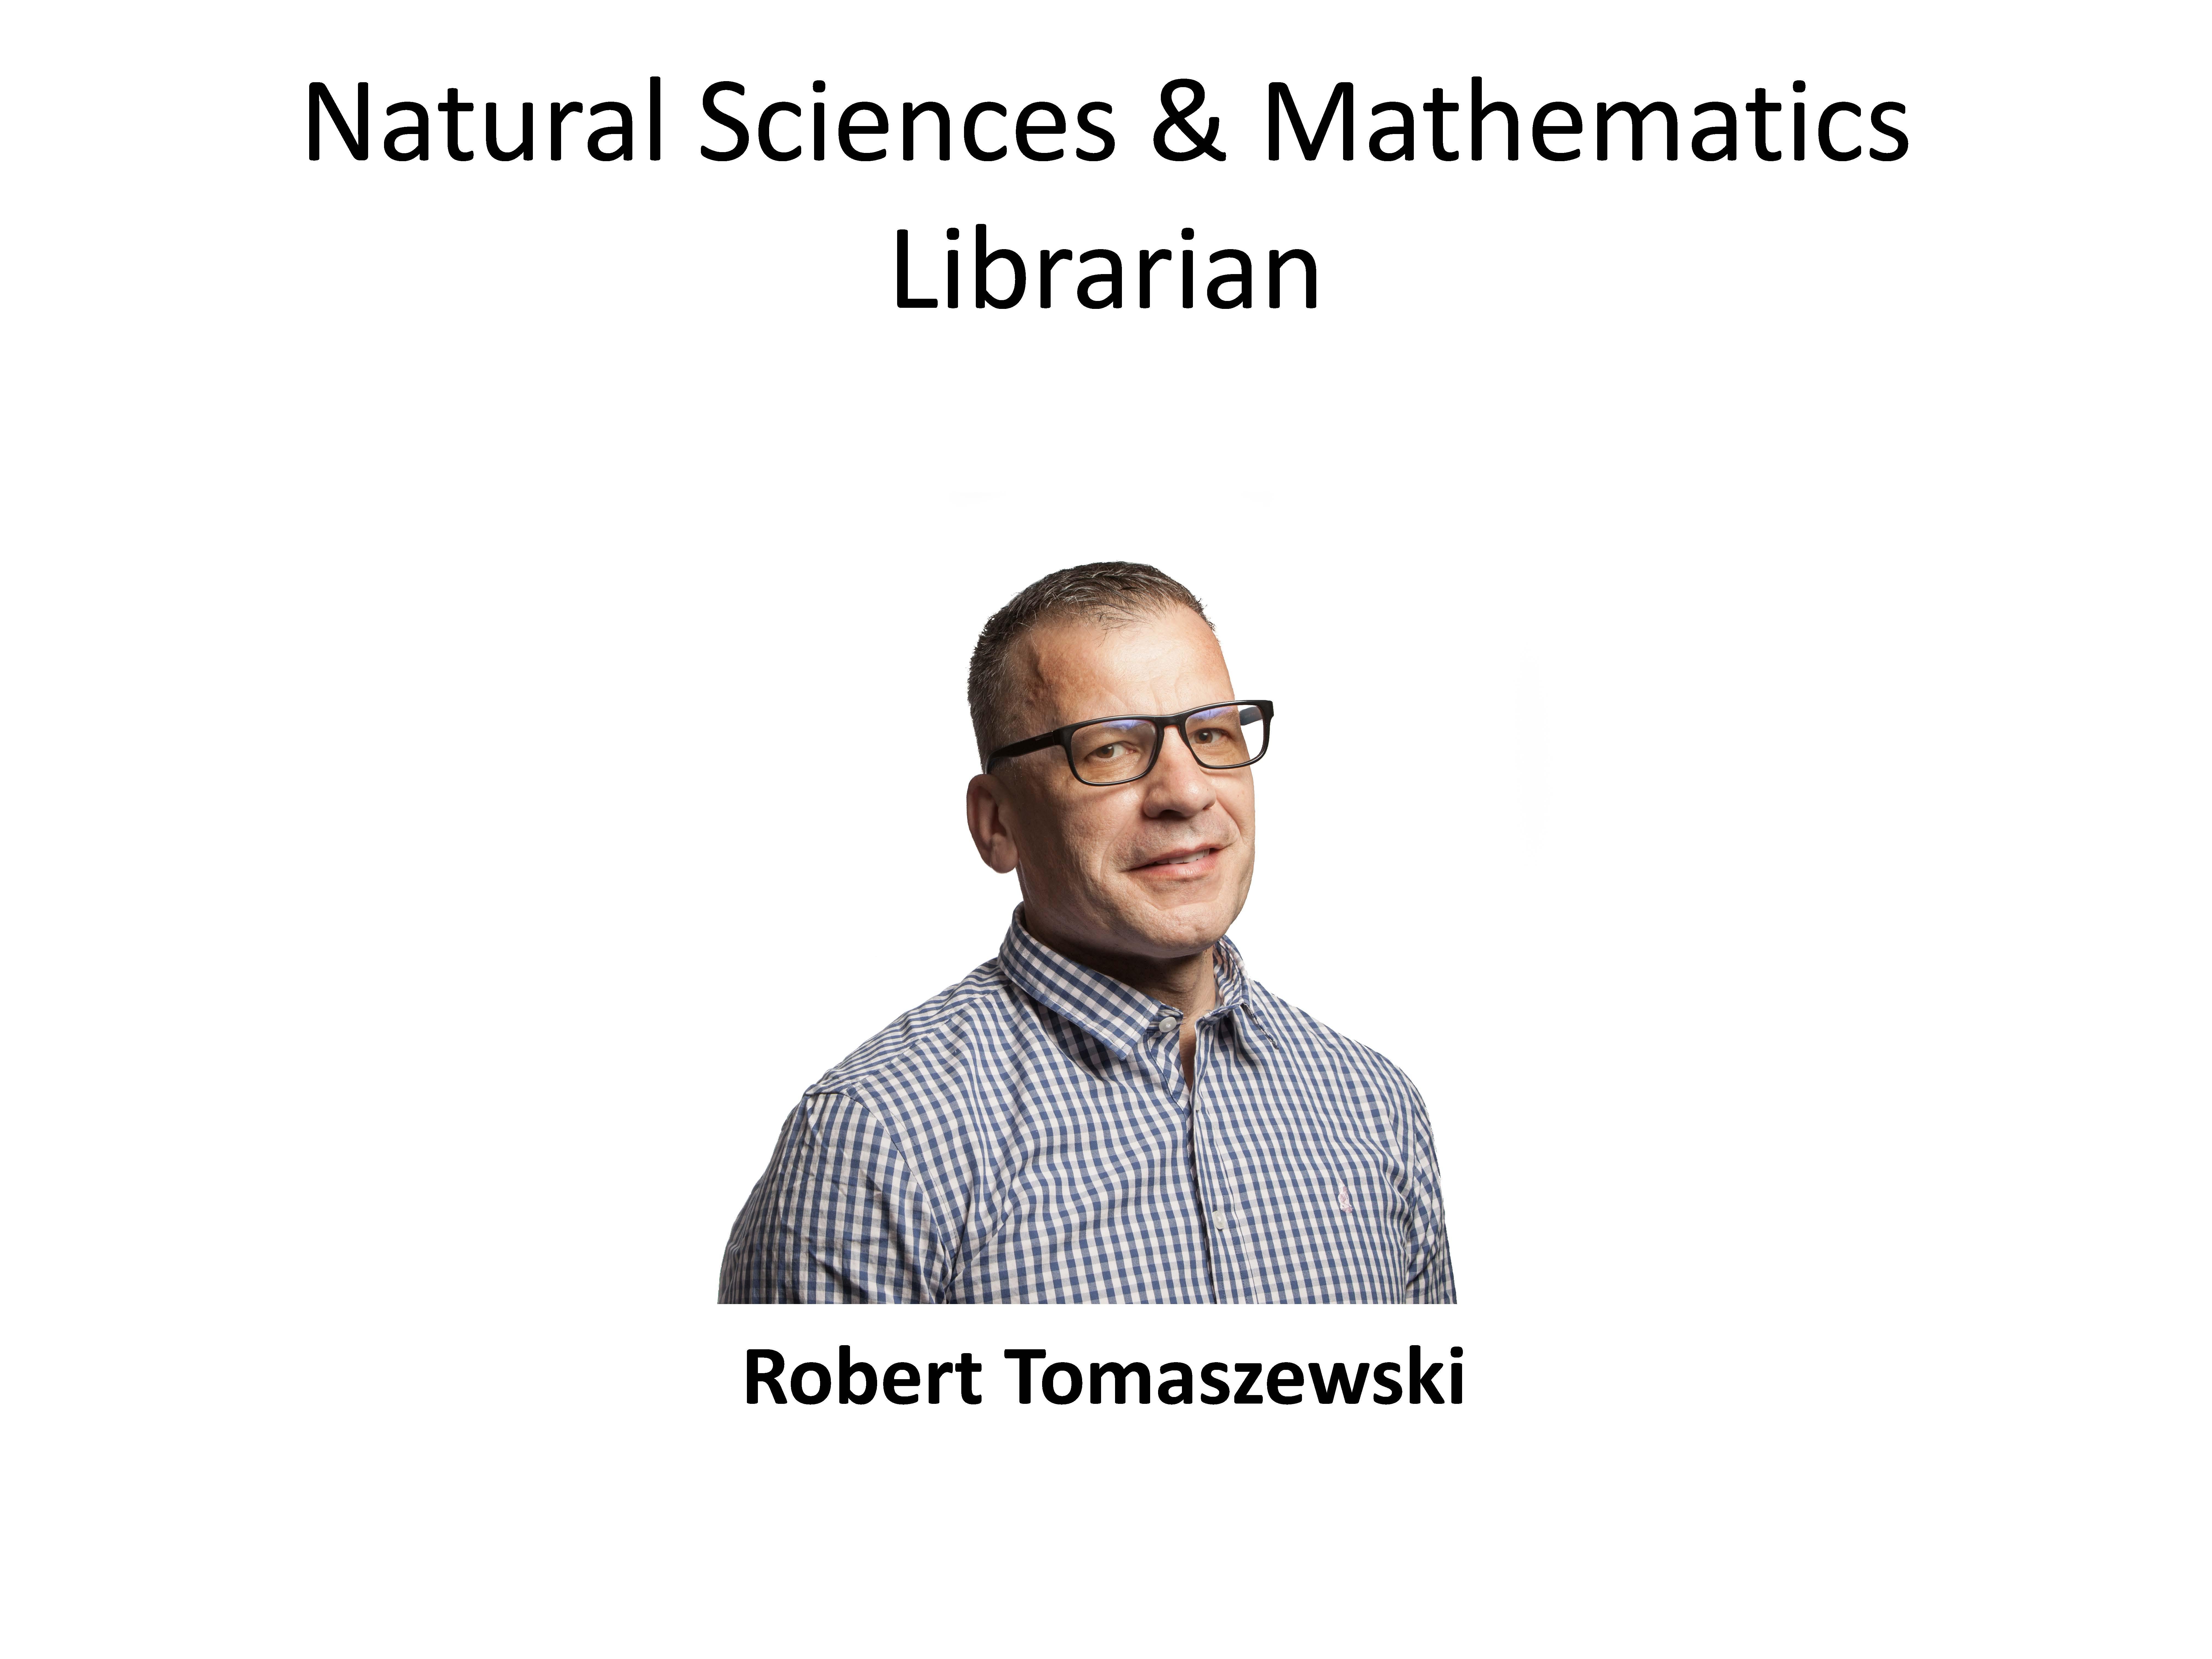 Natural Sciences and Mathematics Librarian